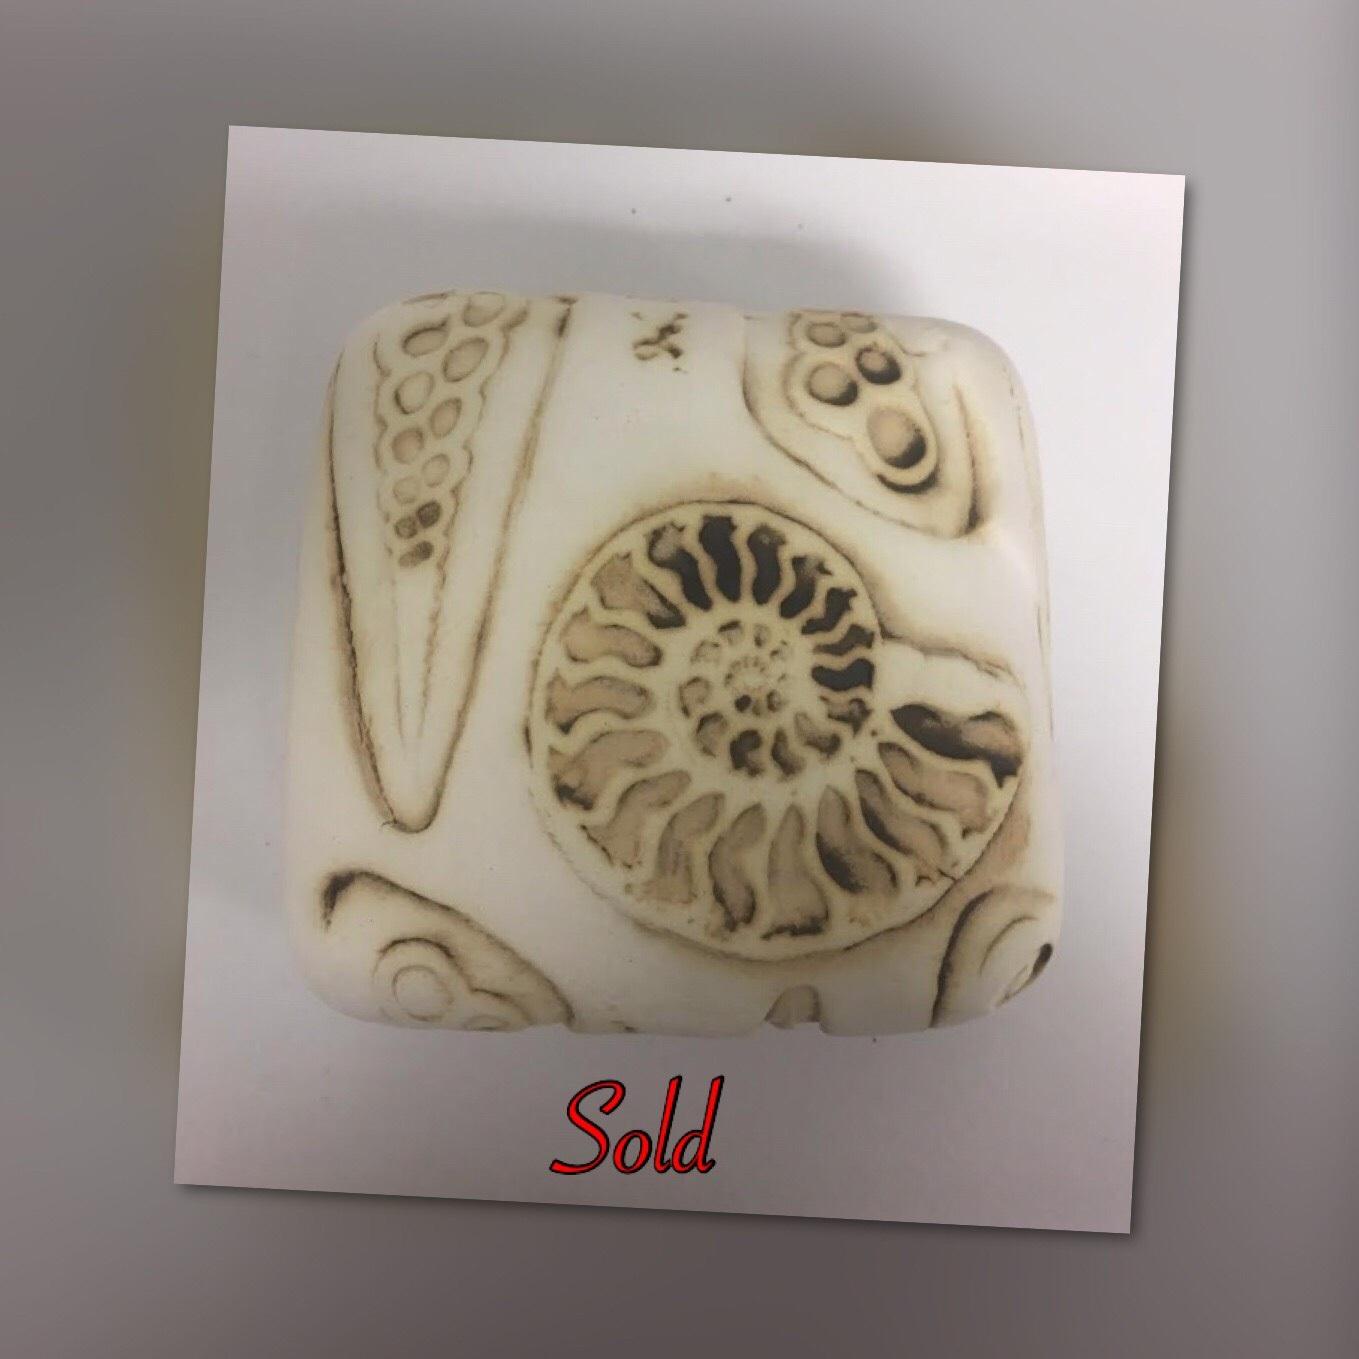 Jenny Mastin Box - Sold.jpg